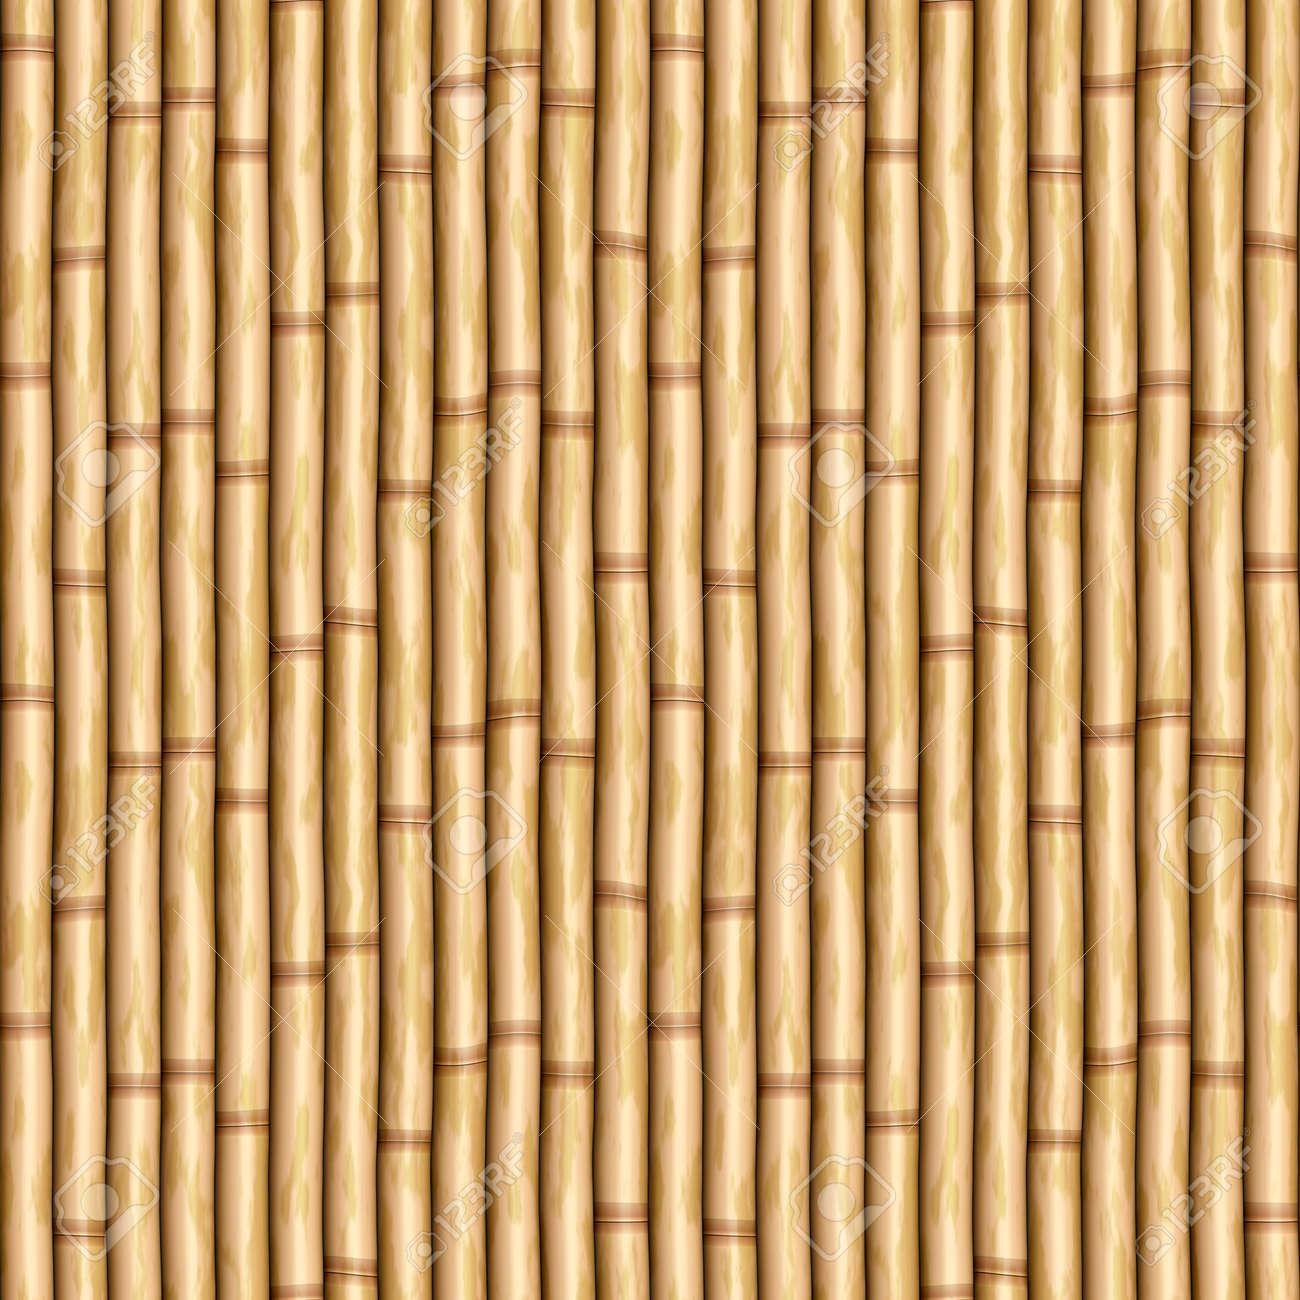 Bamboo Poles As Wall Or Curtain Royalty Free Cliparts, Vectors, And ...